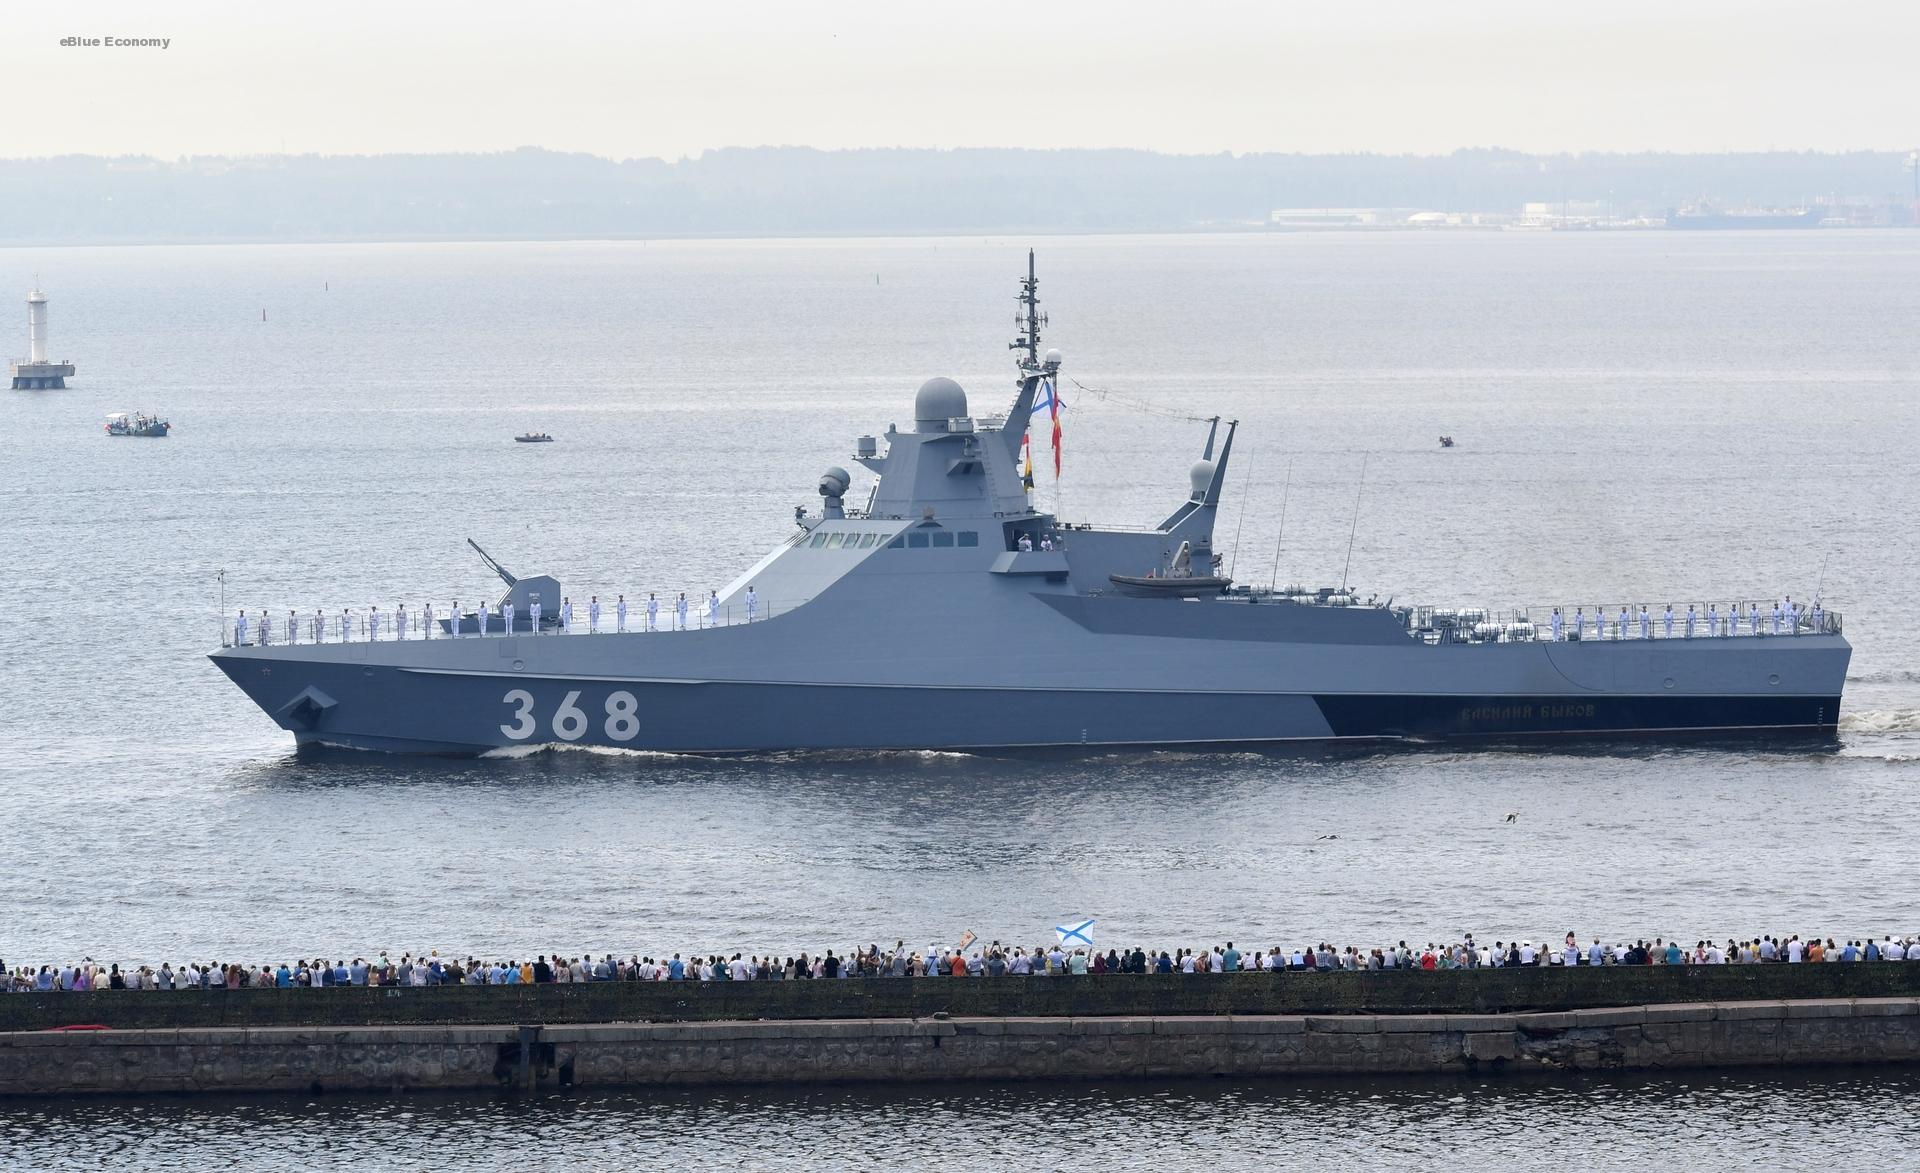 eBlue_economy_Submarine Kolpino of RF Navy's Black Sea Fleet returns to the base